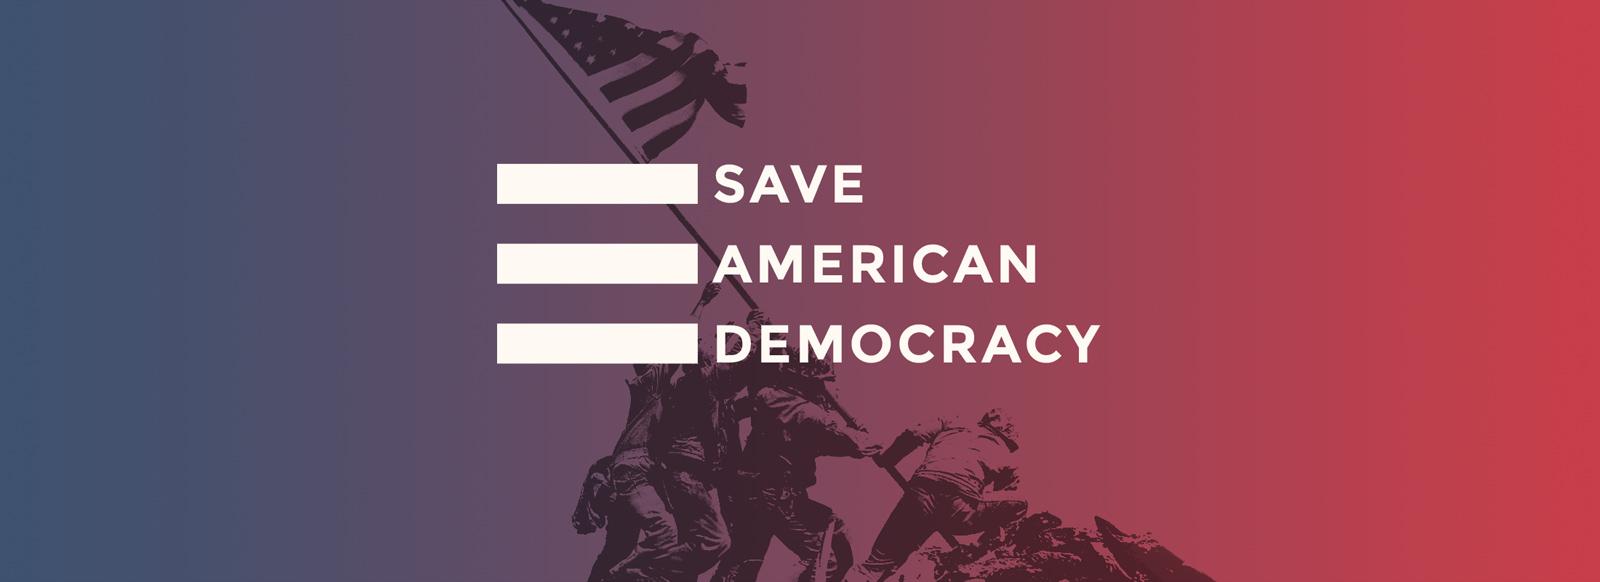 Save American Democracy